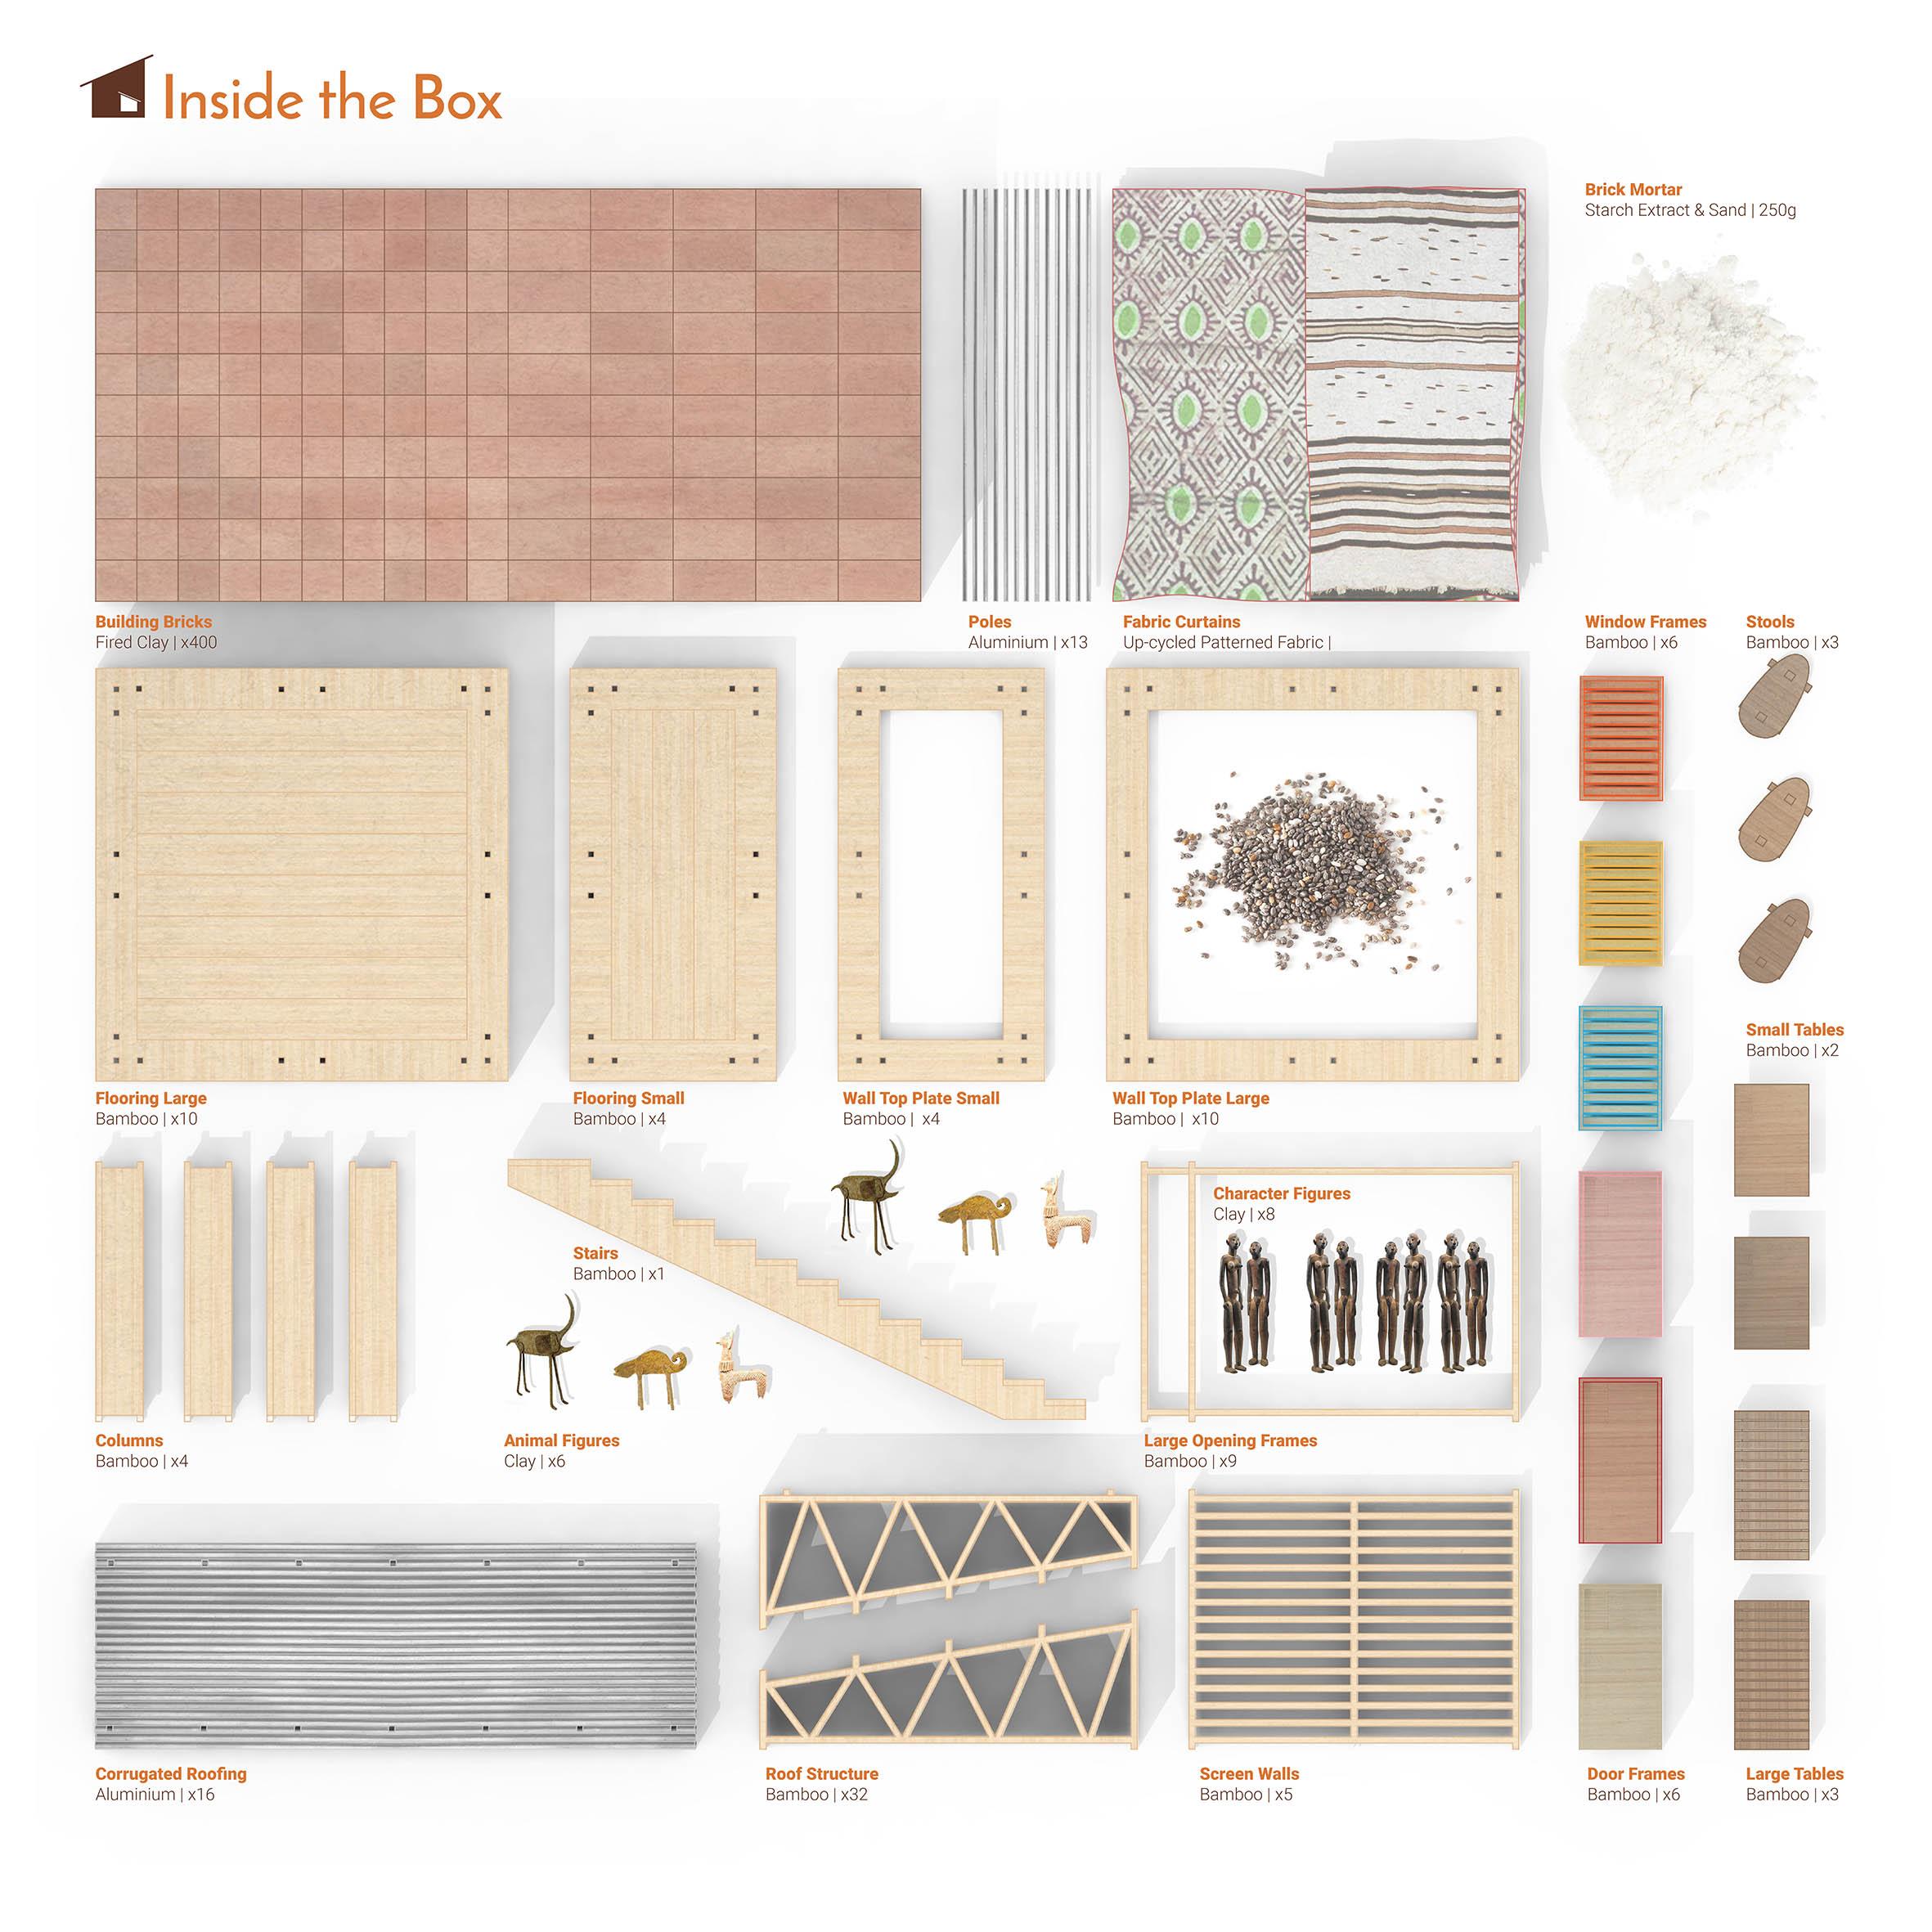 House 4 House, by Agnieszka Filipowicz, Ania Pieranska & Otis Sloan Brittain, AUGA Studio; Images Courtesy: Cradle to Cradle Products Innovation Institute